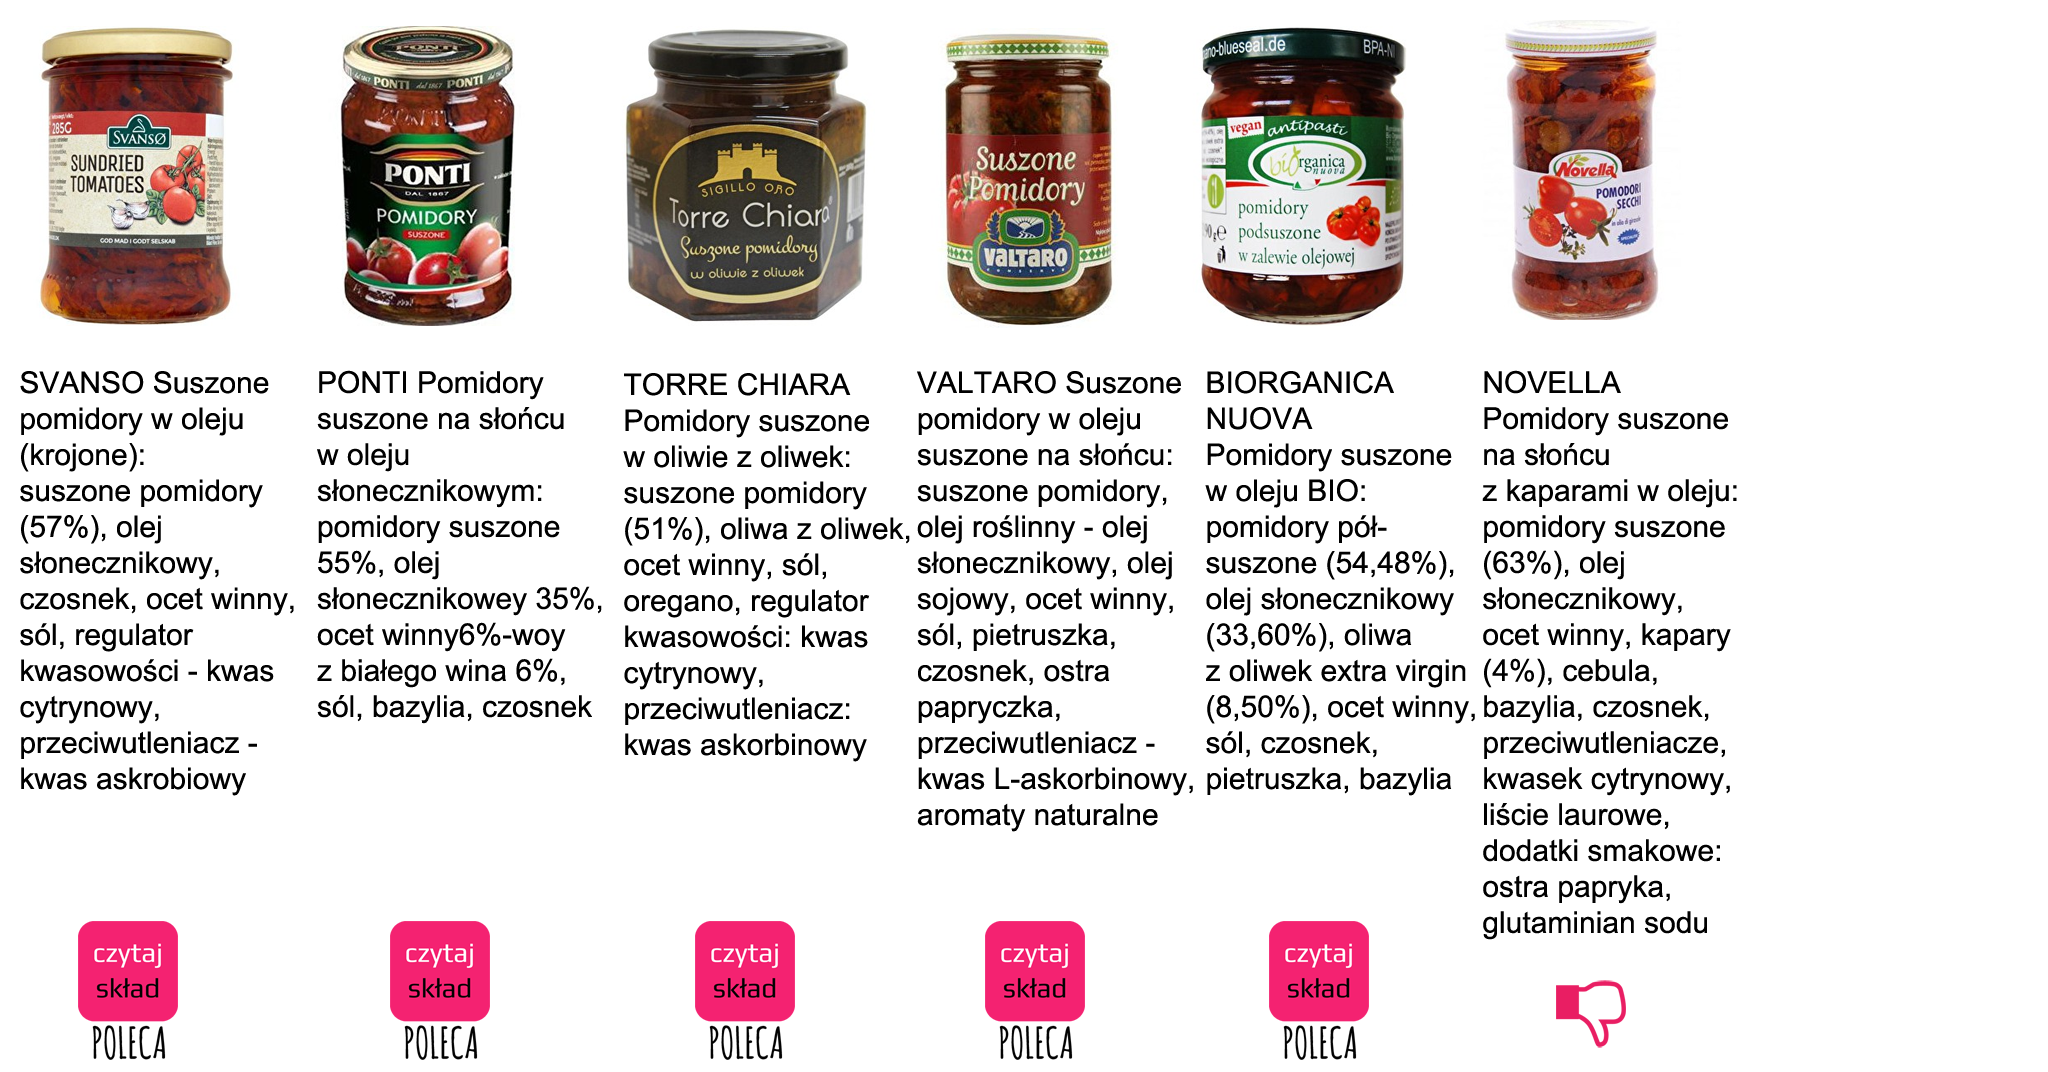 http://czytajsklad.com/wp-content/uploads/2016/11/pomidory-suszone-2.png